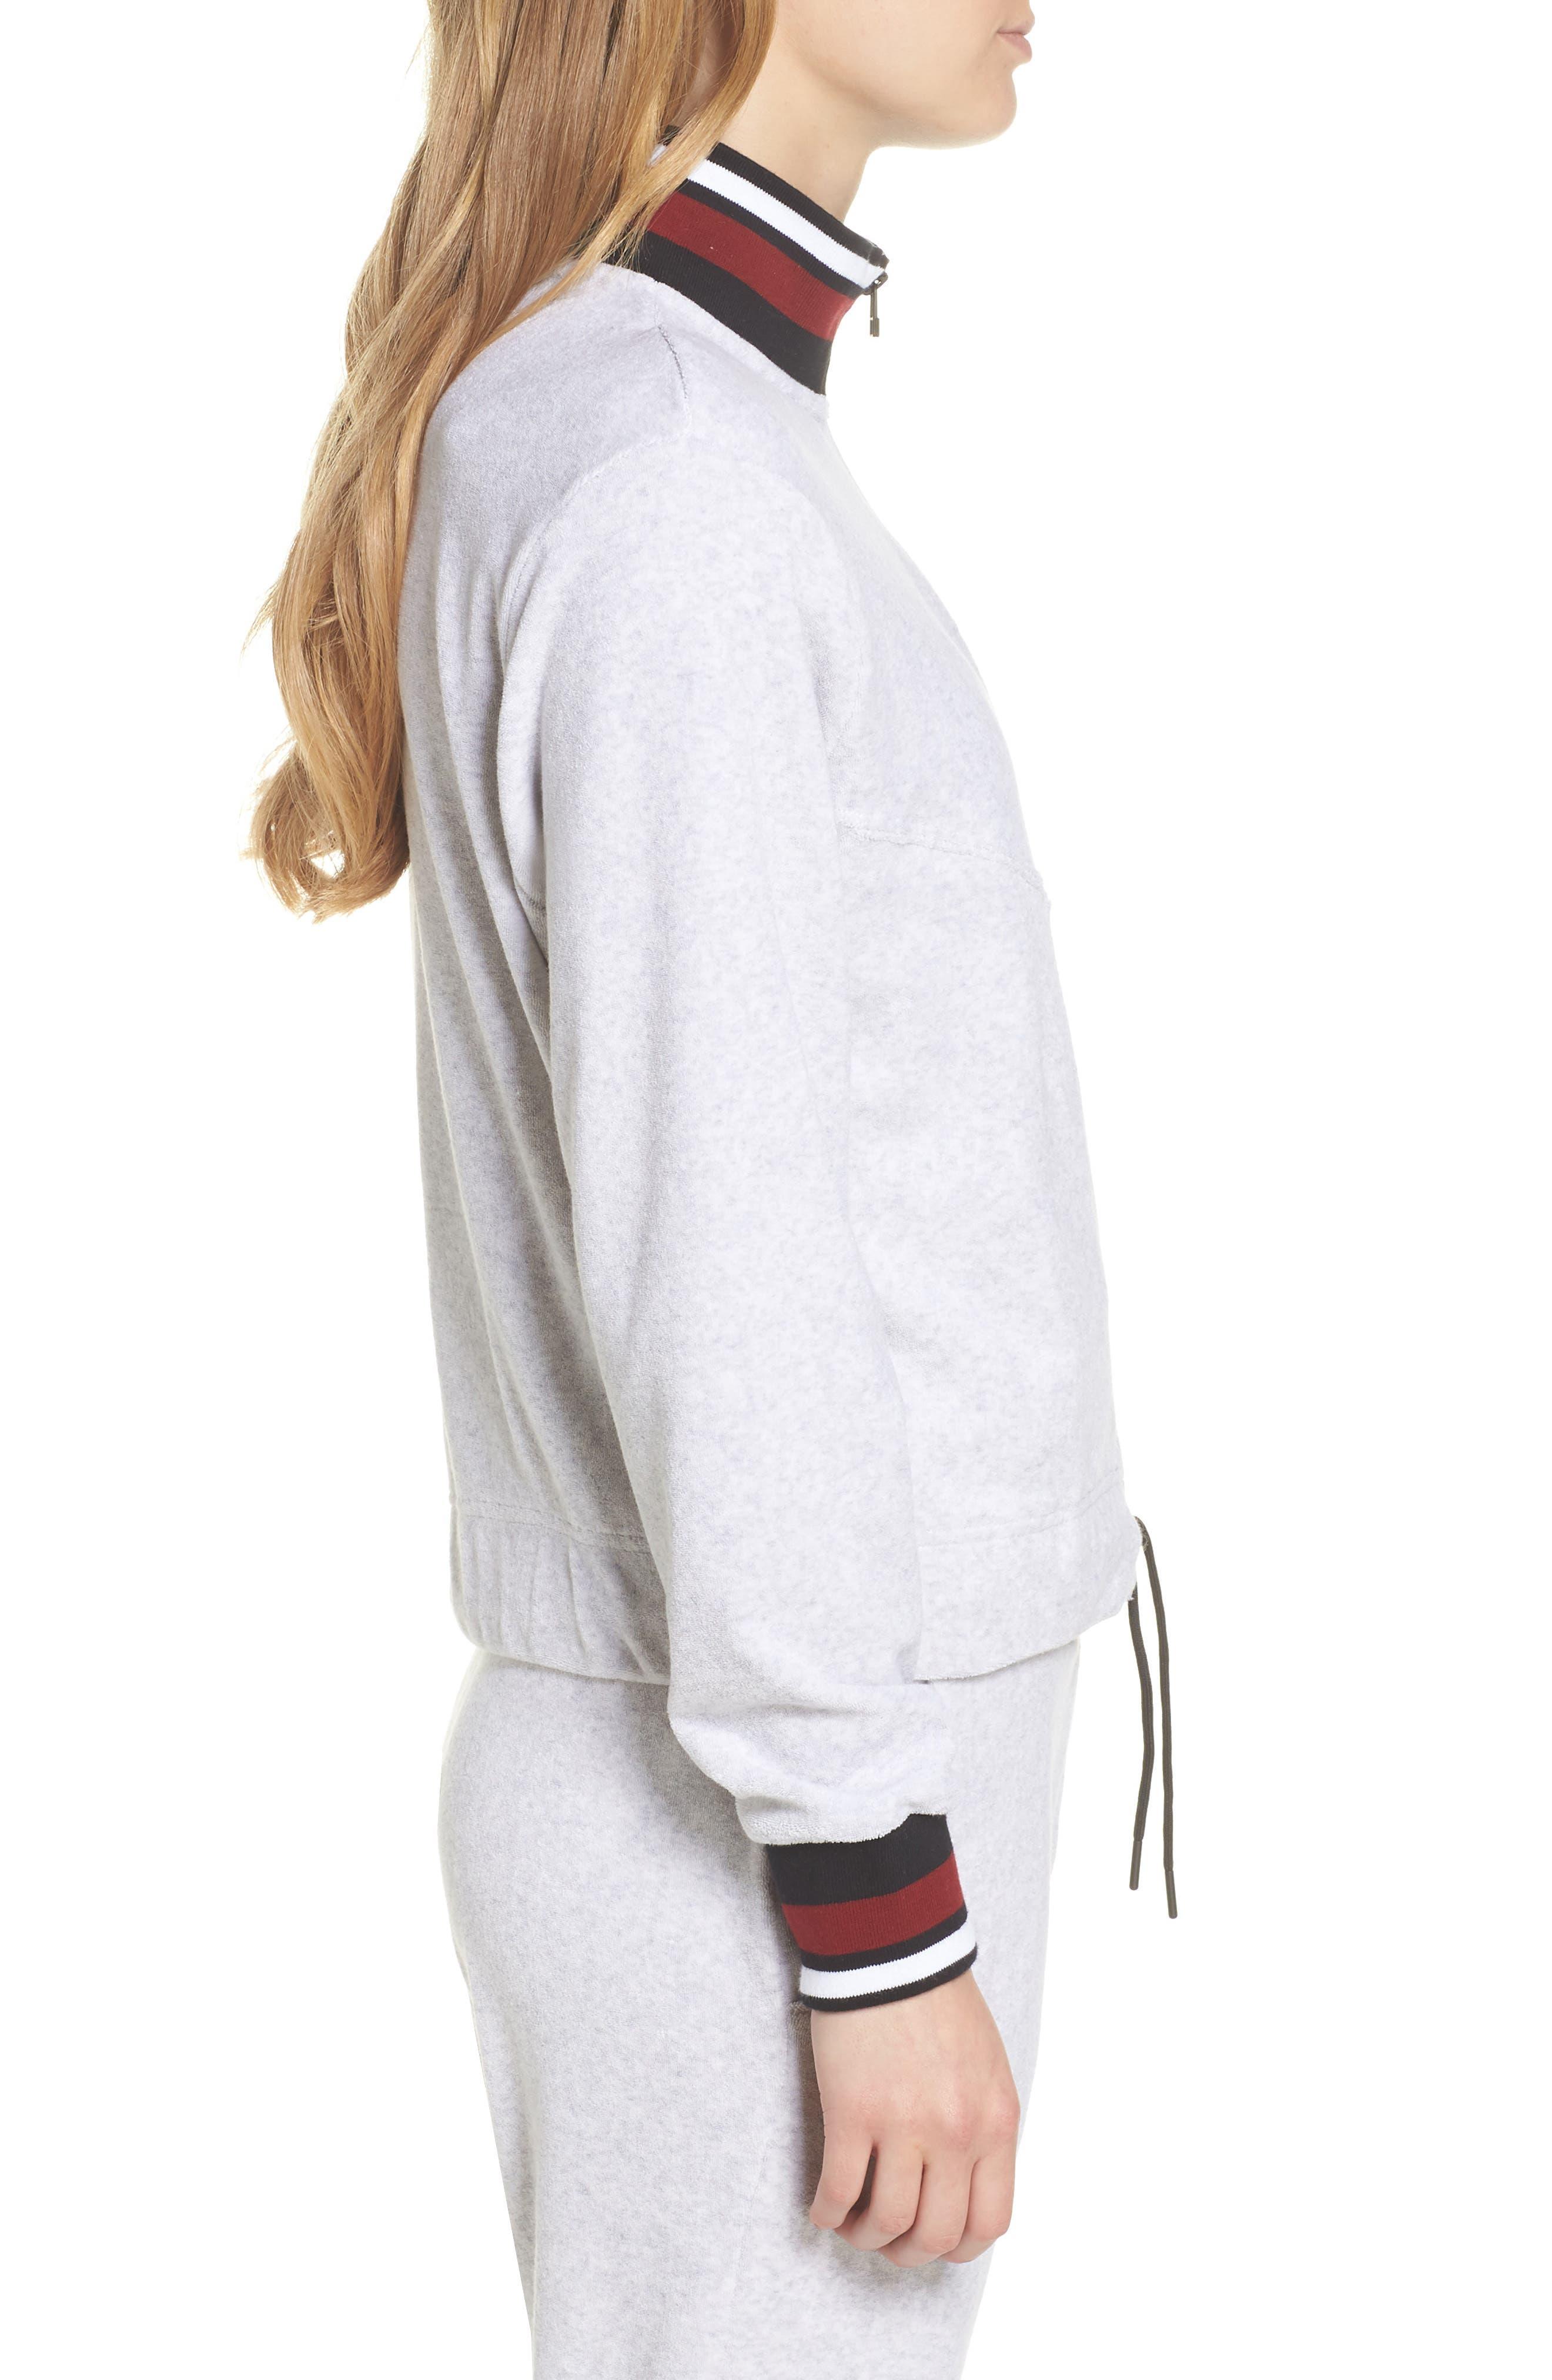 Sportswear French Terry Jacket,                             Alternate thumbnail 3, color,                             Birch Heather/ White/ Black